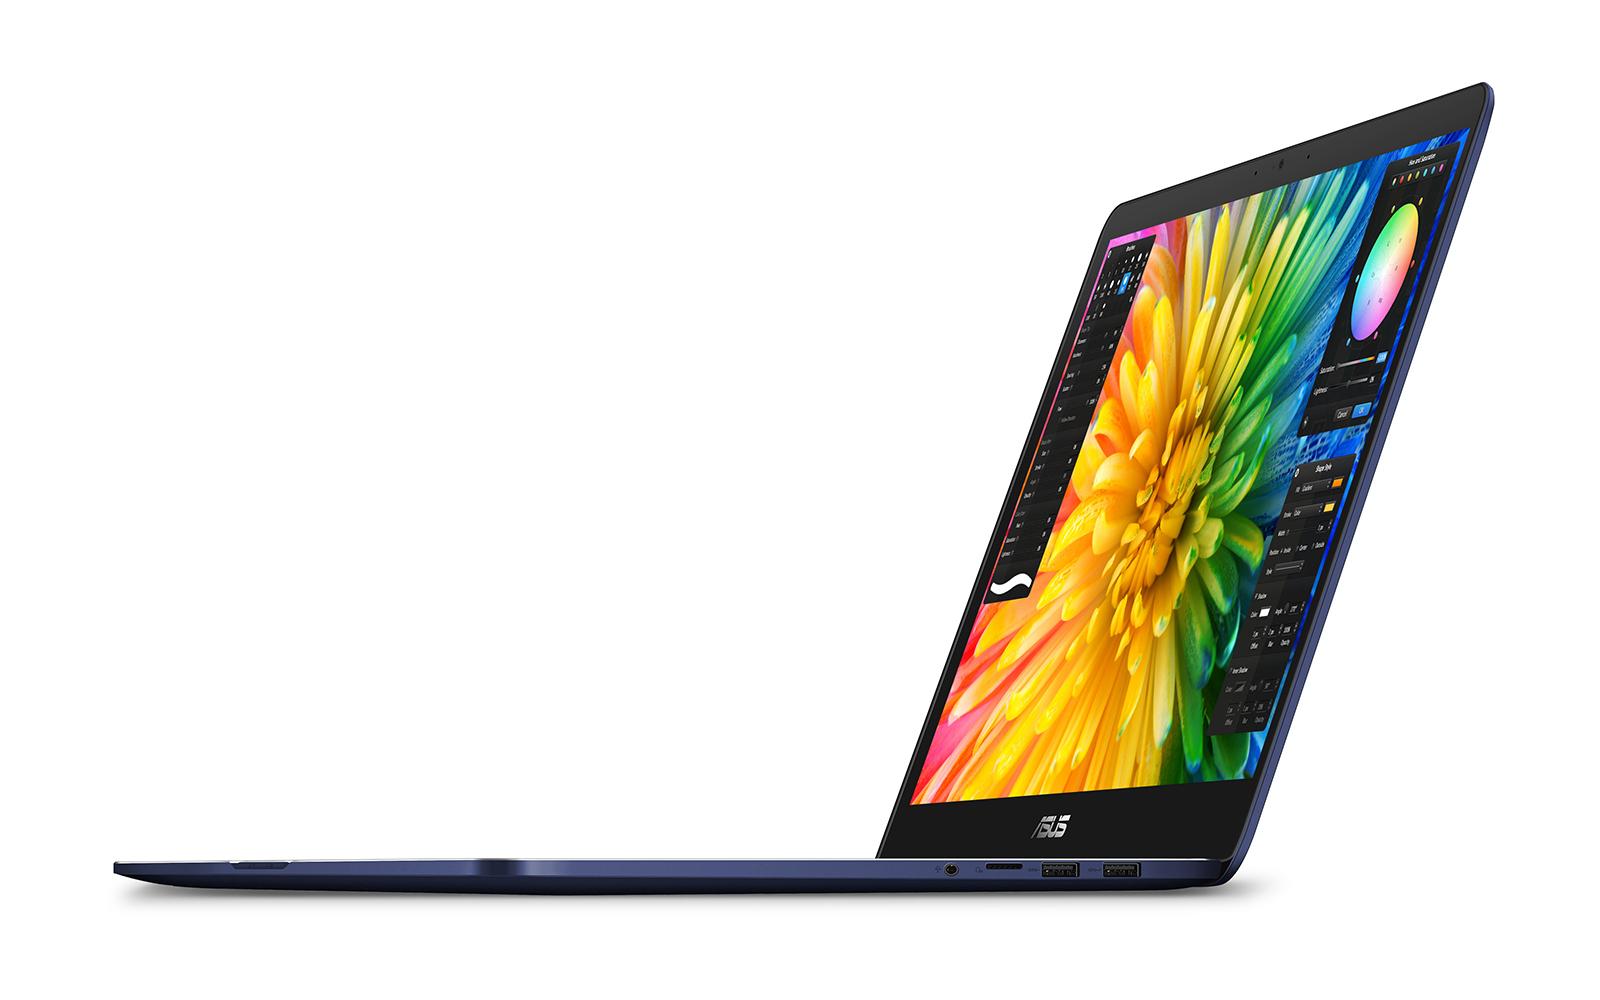 Asus Zenbook Pro 15 UX550 review (UX550VD - Core i5, GTX 1050)